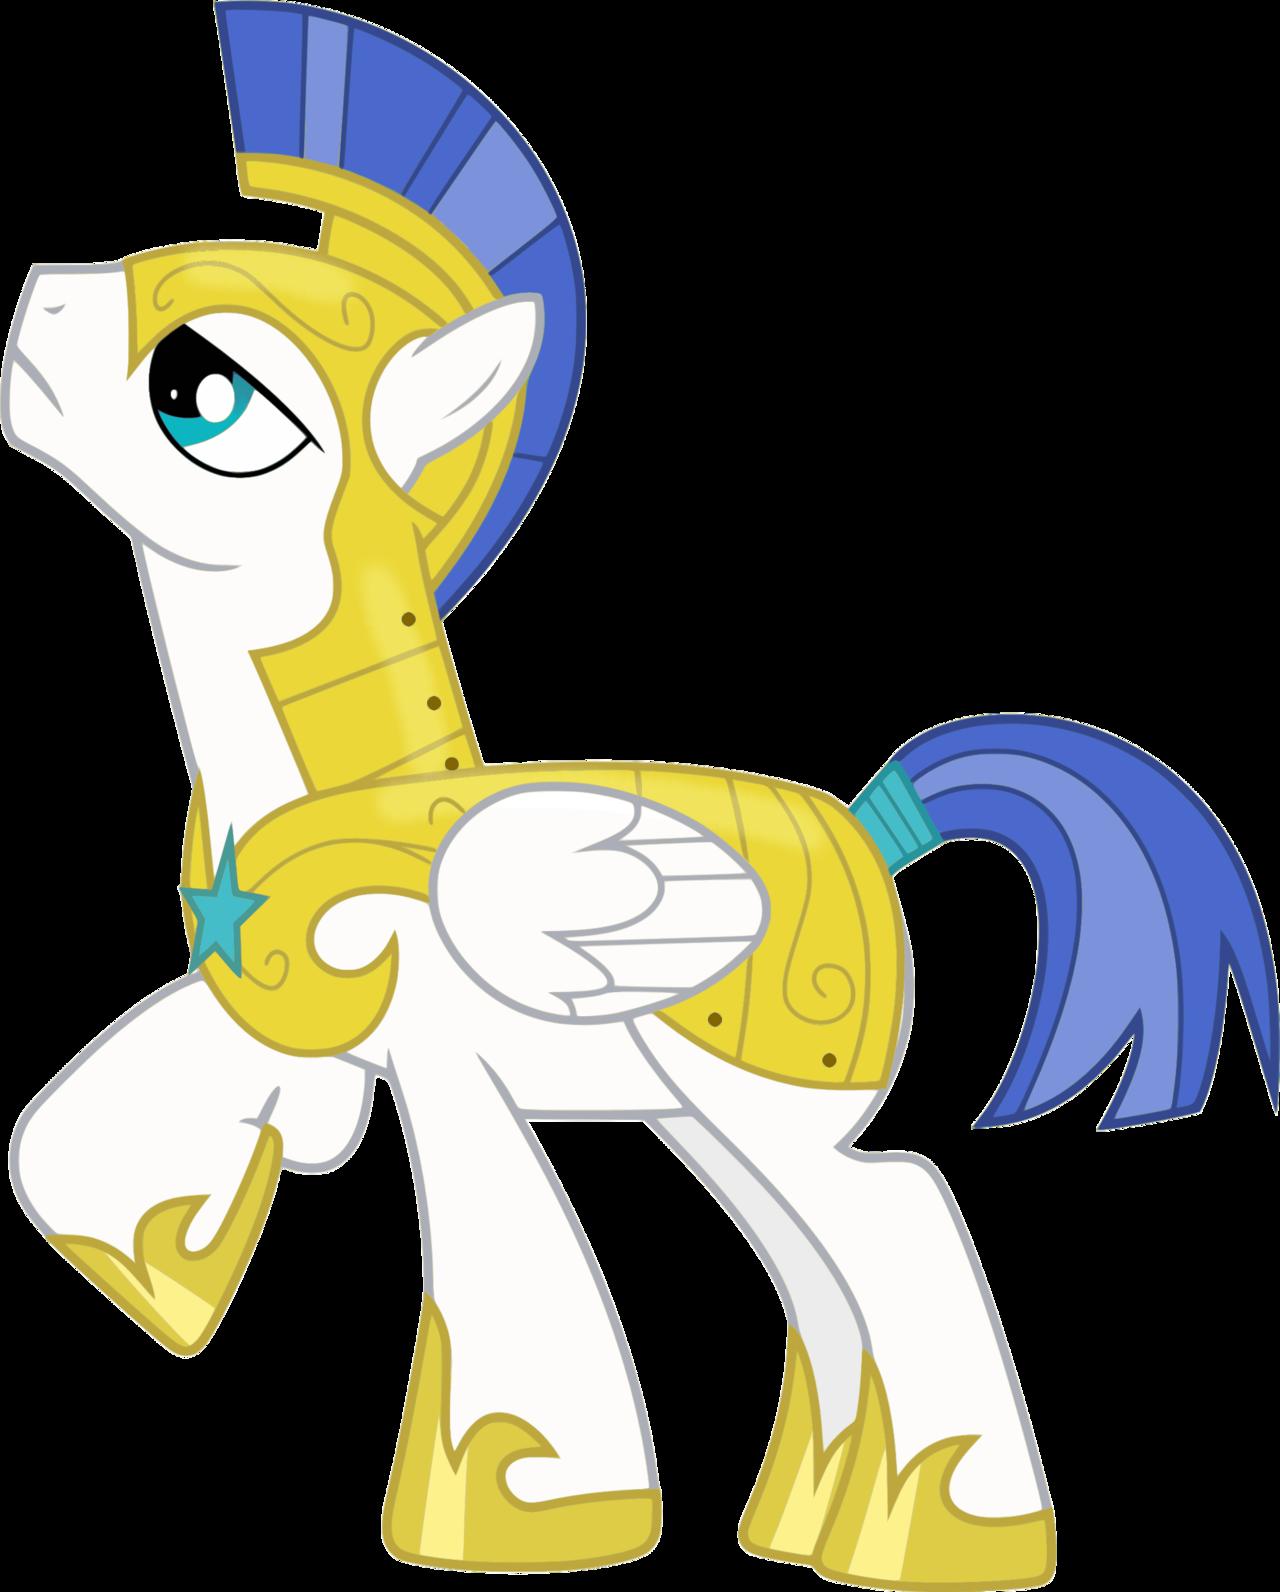 Výsledek obrázku pro mlp royal guard